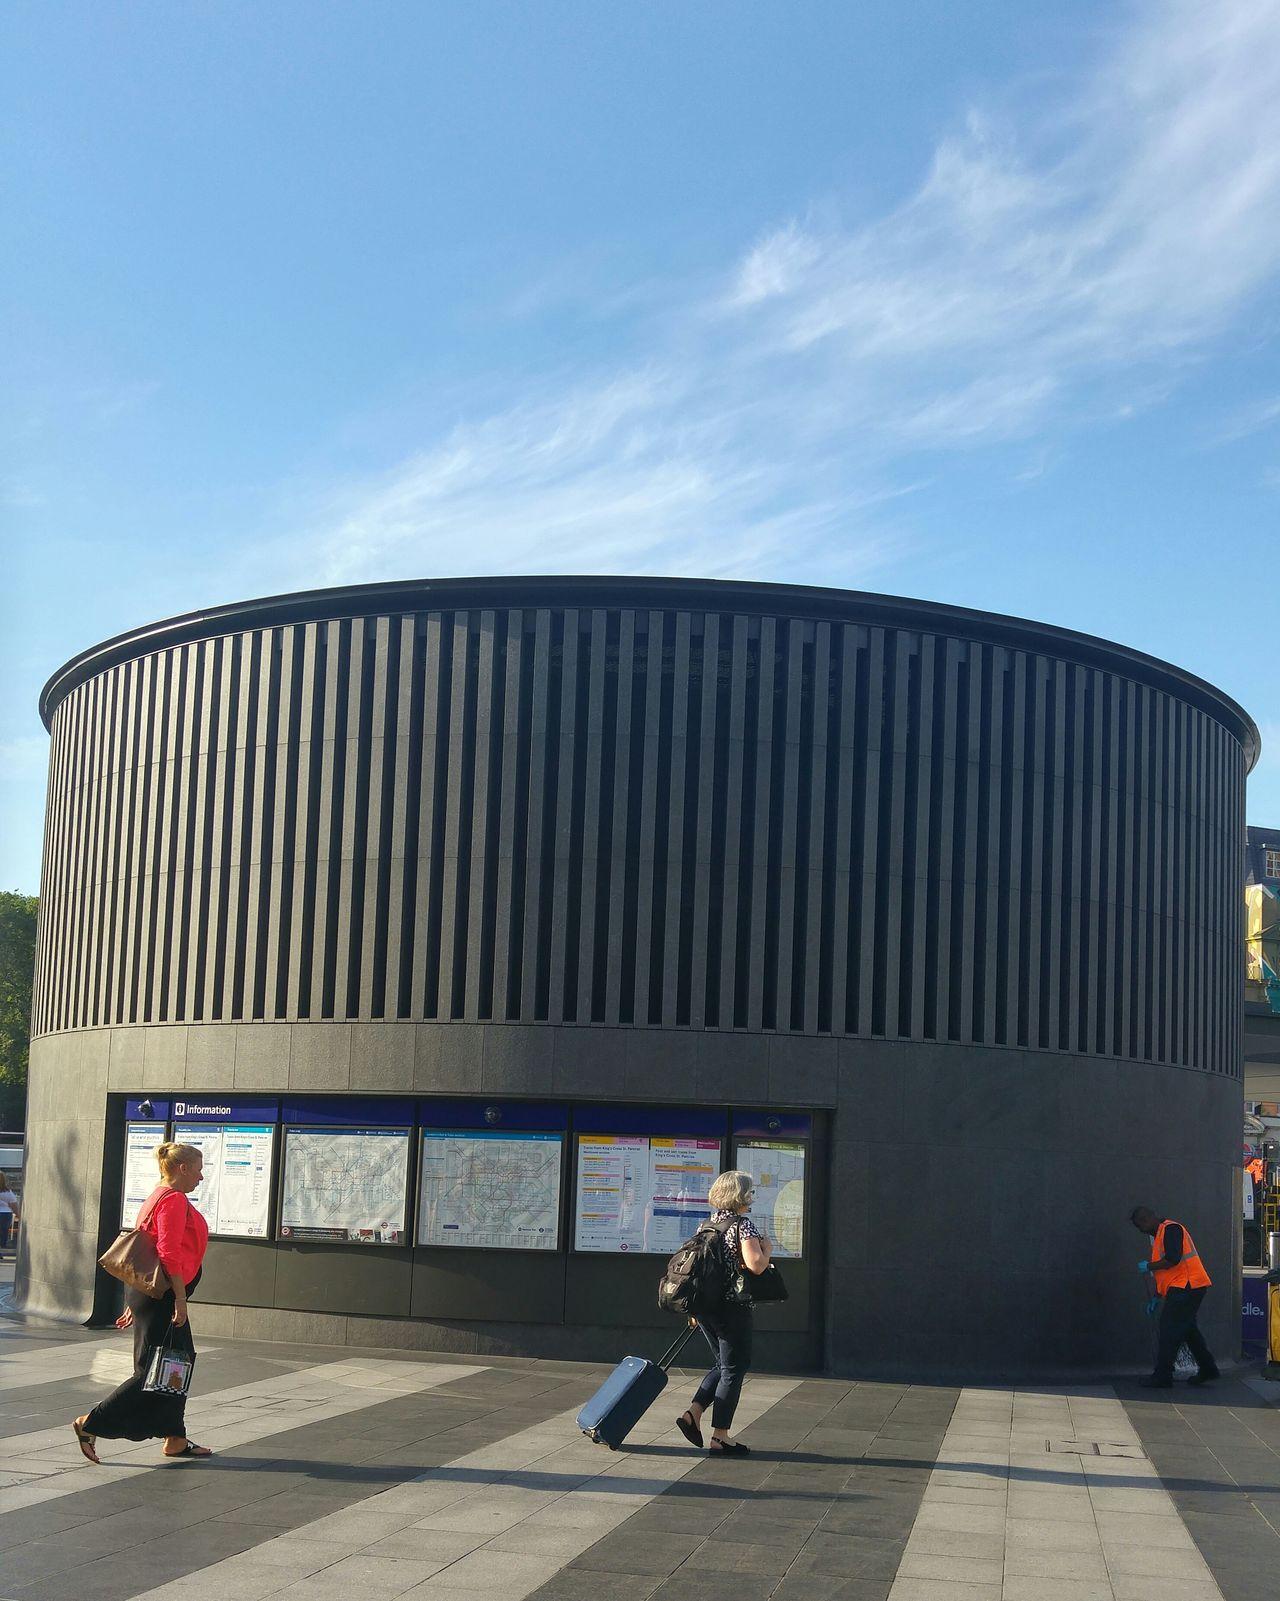 Beautiful stock photos of kreuz, built structure, architecture, full length, outdoors